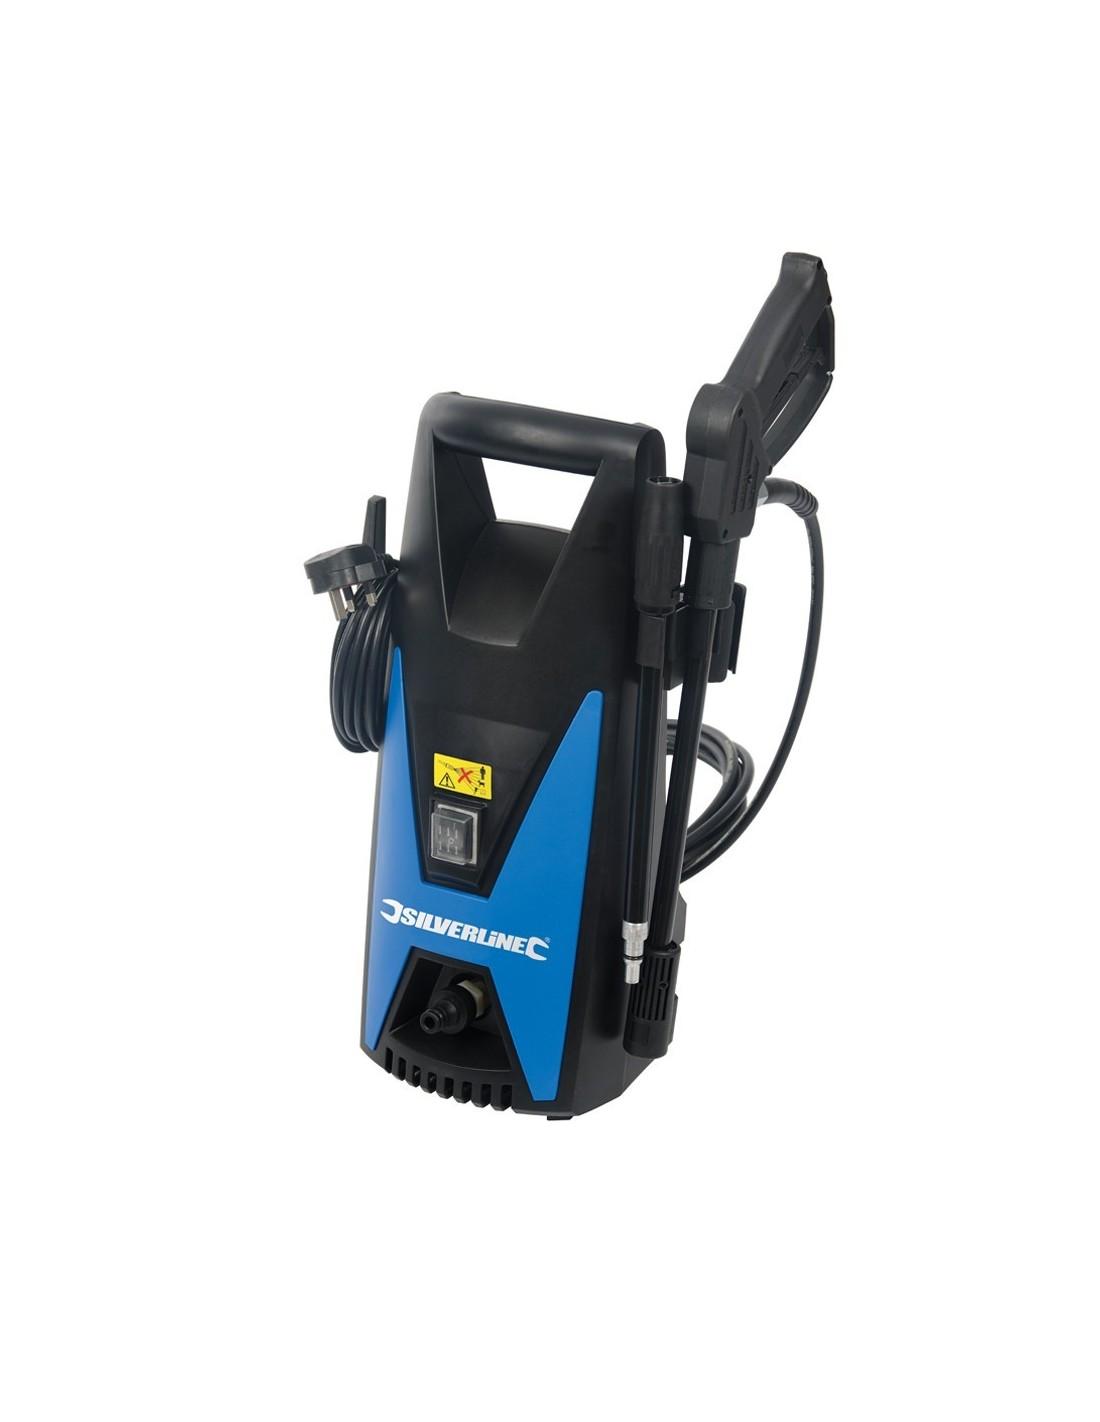 Nettoyeur haute pression 1650 w 105 bars ebay for Fonctionnement nettoyeur haute pression